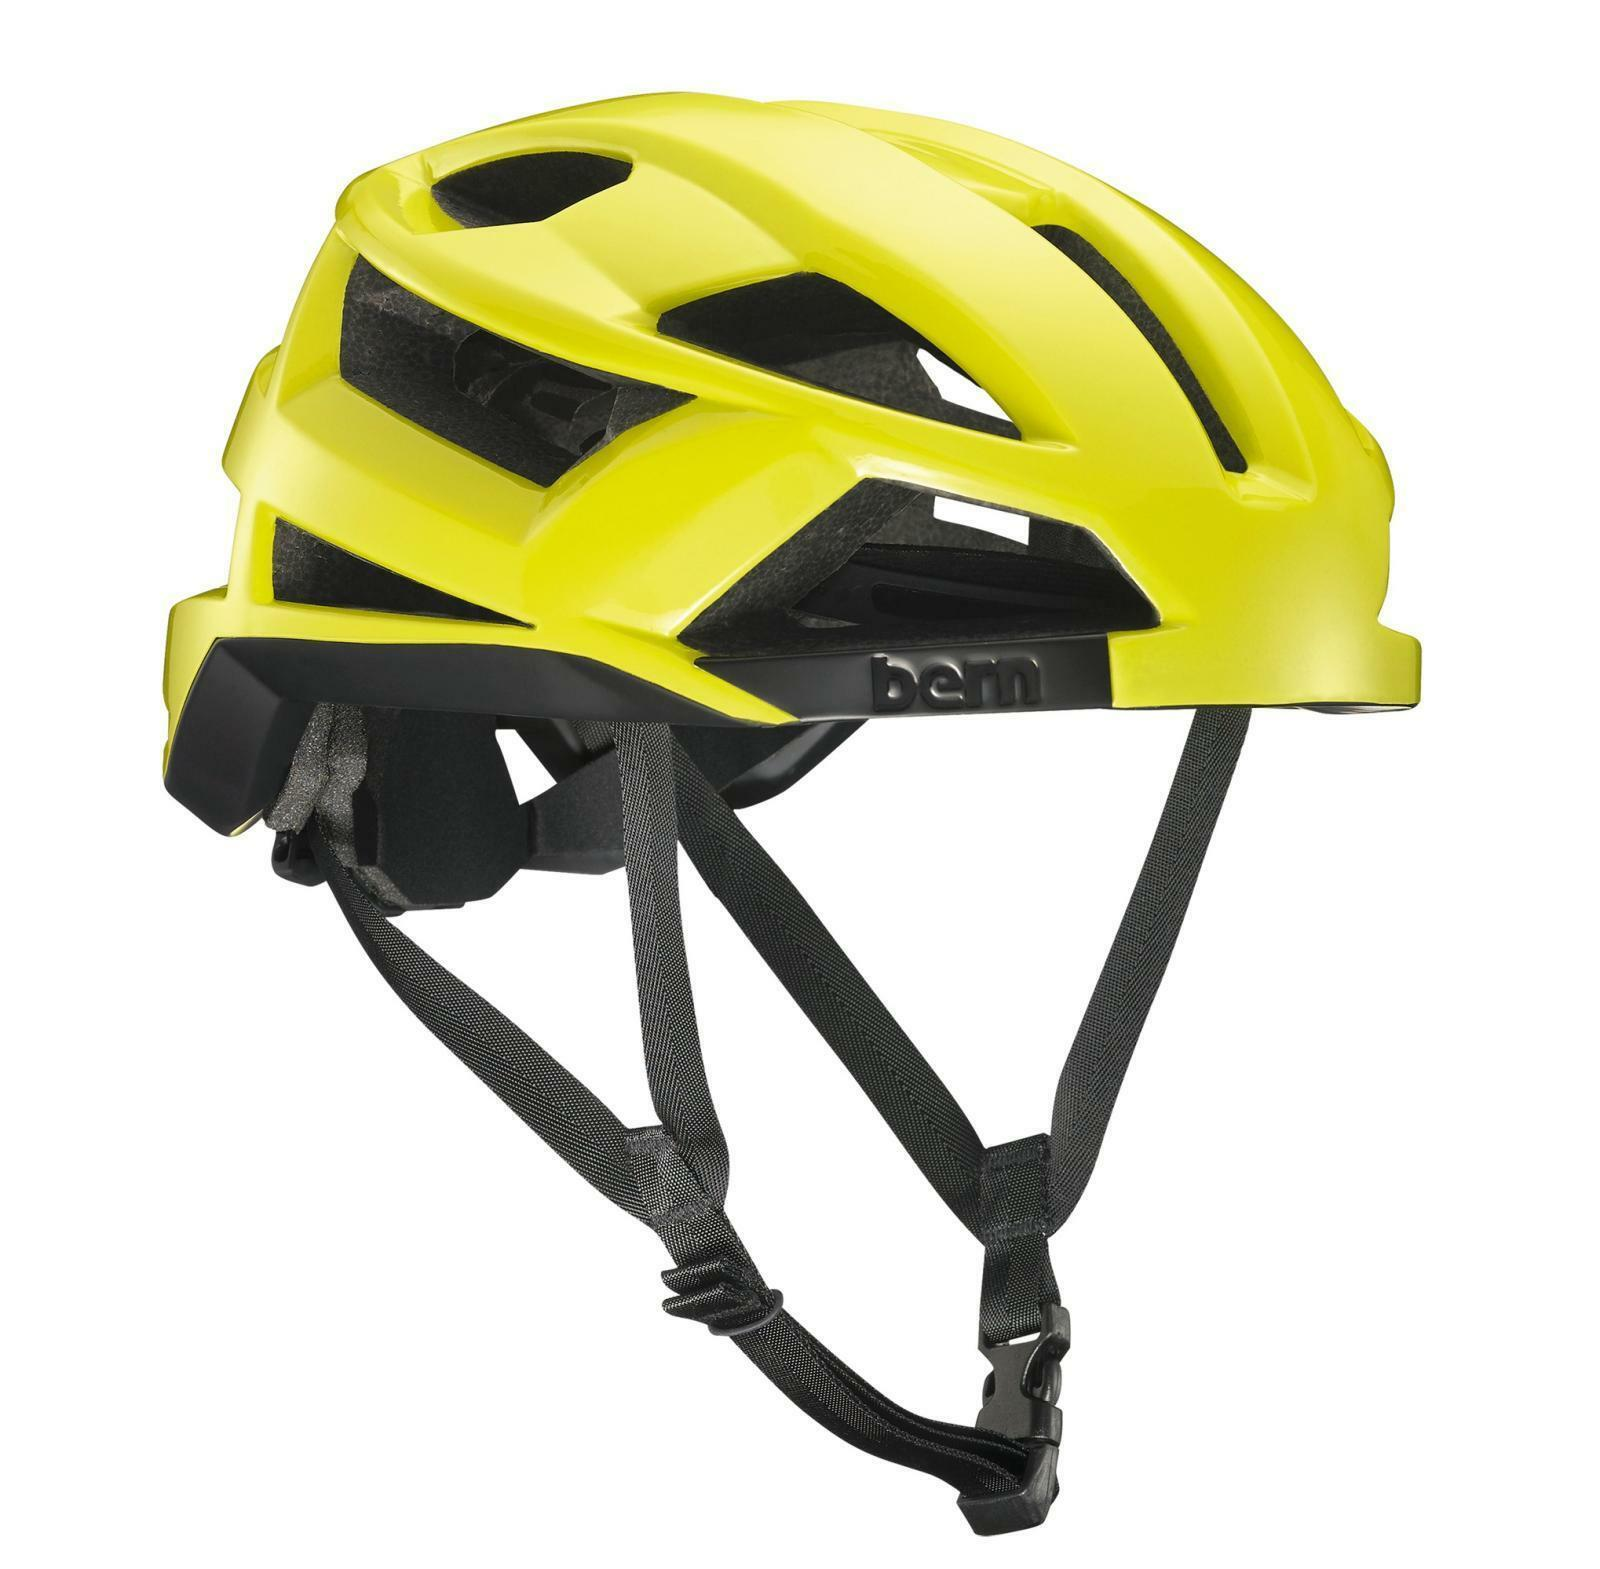 Bern Helm FL-1 Inmold Fahrrad Sport Helm, Fahrradhelm  L  59-62cm, Neon yellow